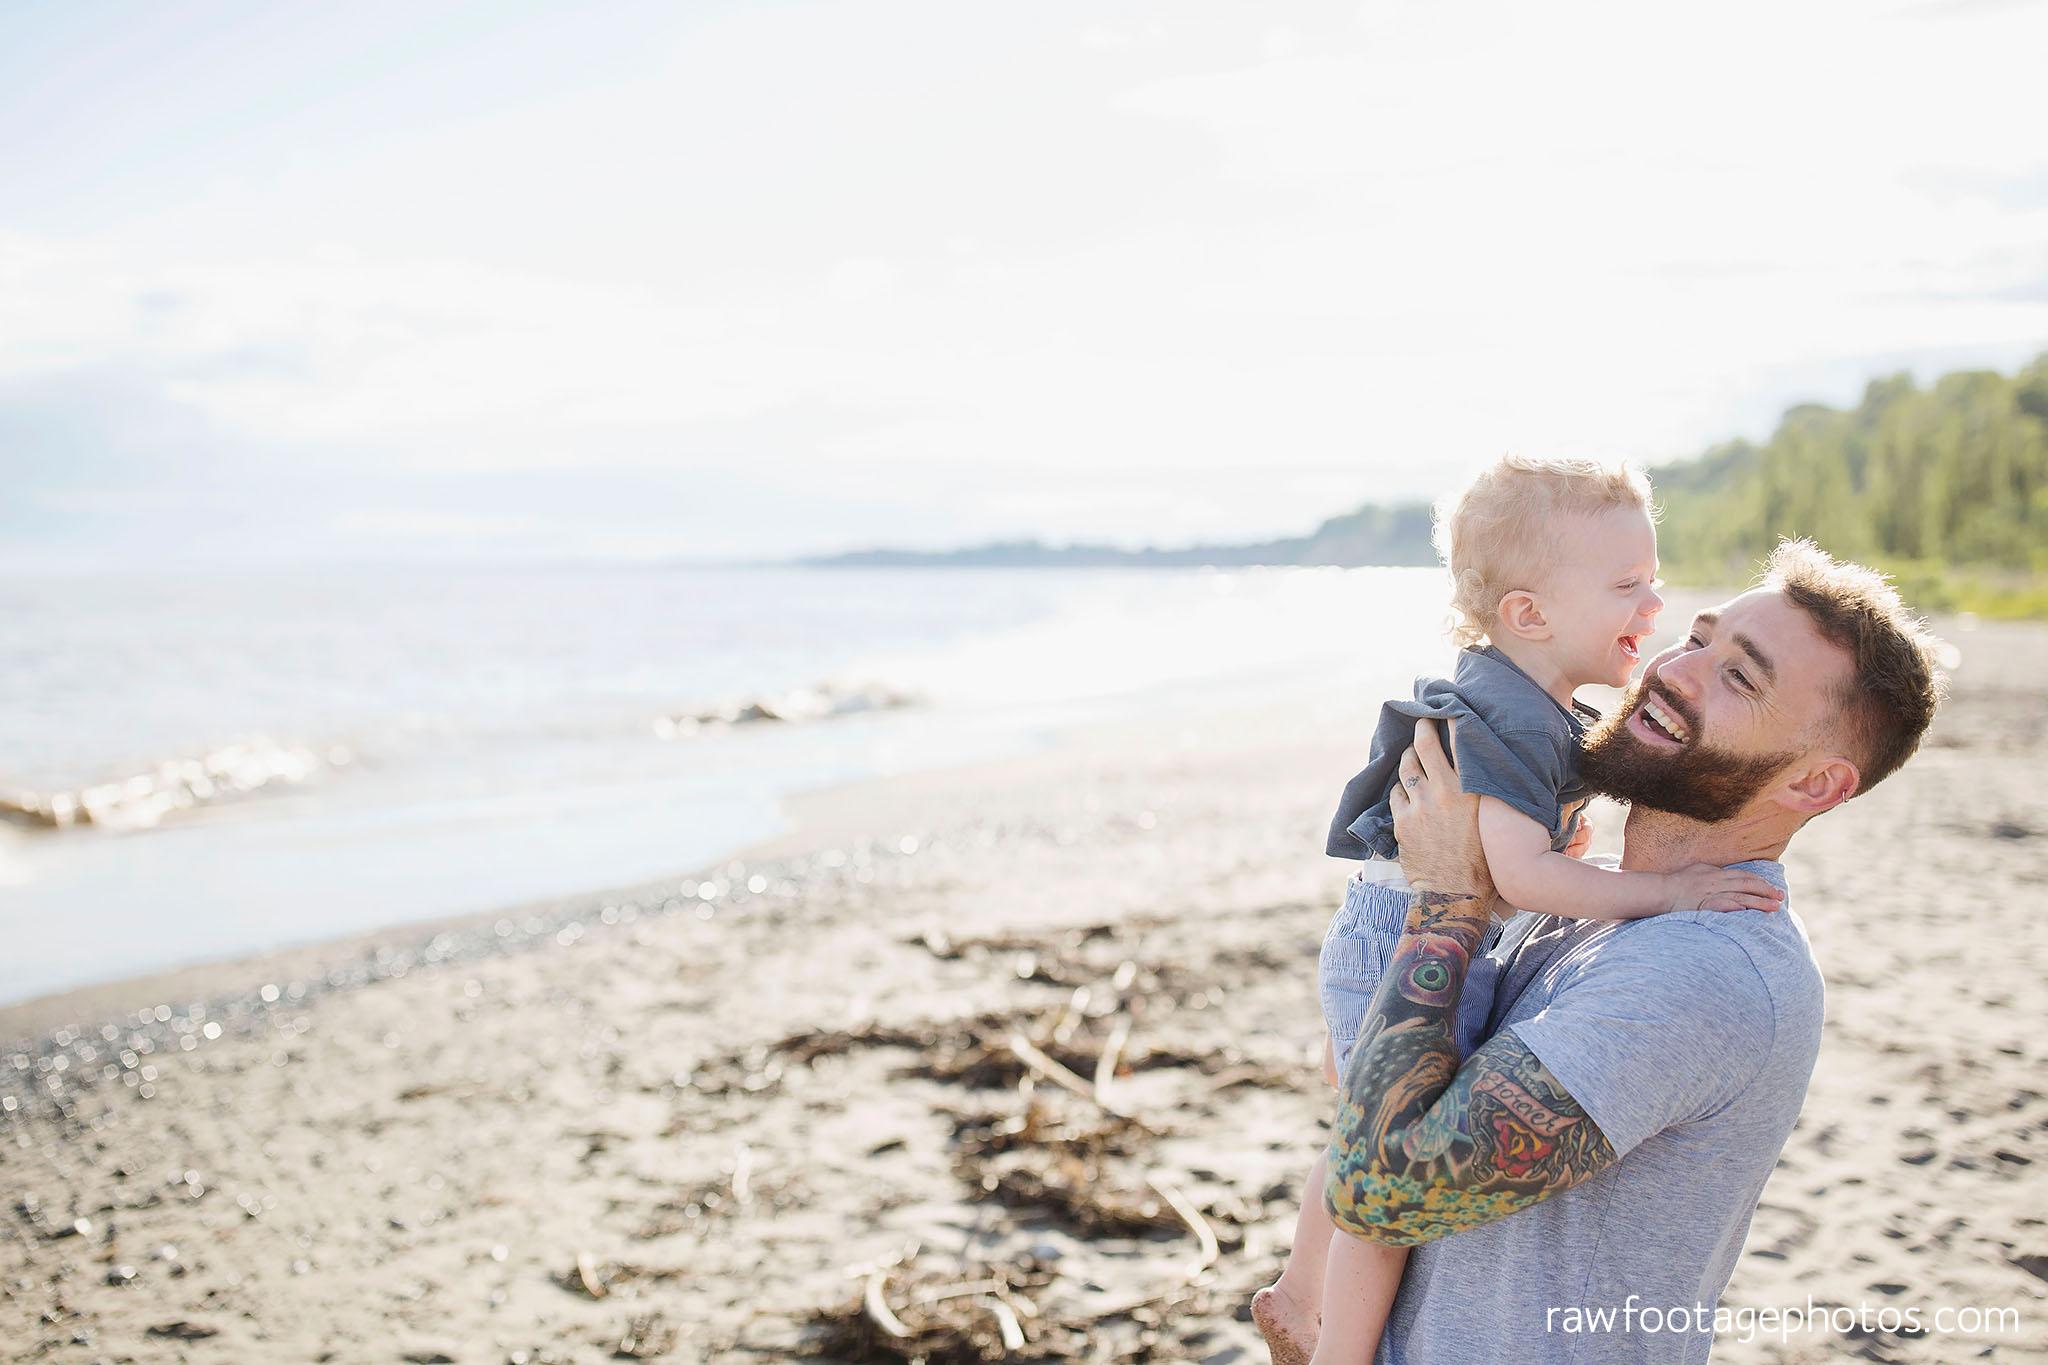 london_ontario_photographer-raw_footage_photography-beach_minis-port_stanley_beach-family_photographer-couple_photographer-lifestyle_photographer056.jpg